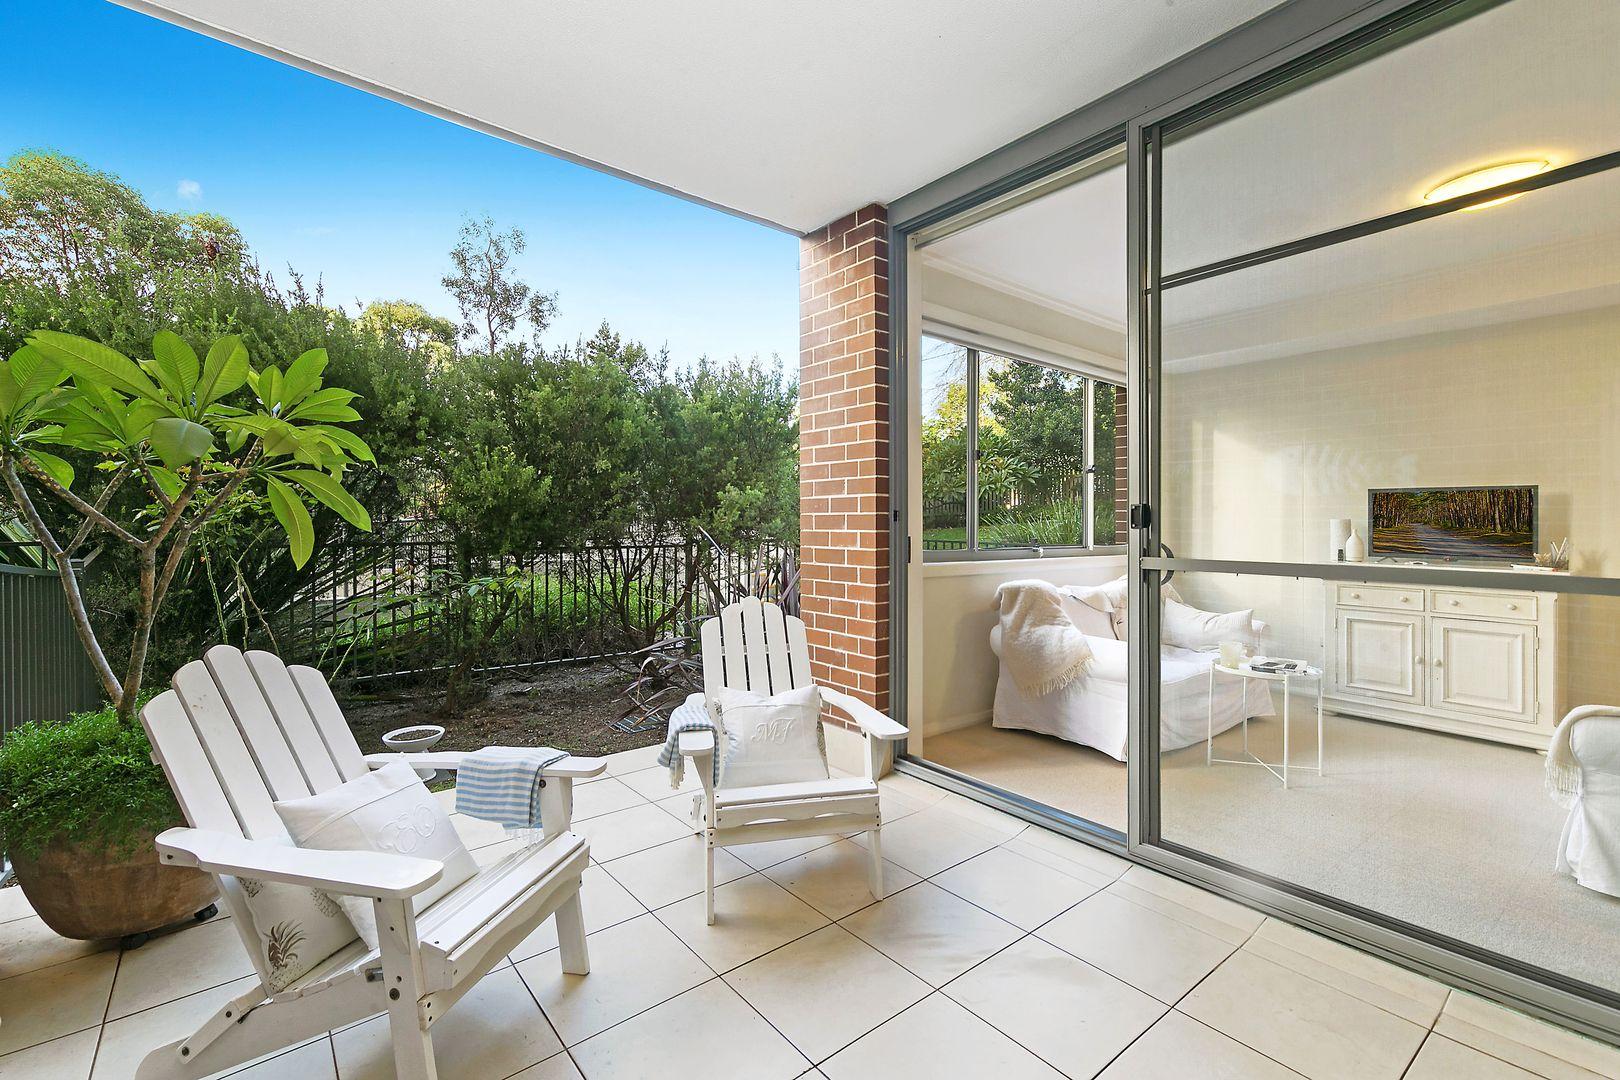 45/2 Warrangi Street, Turramurra NSW 2074, Image 0